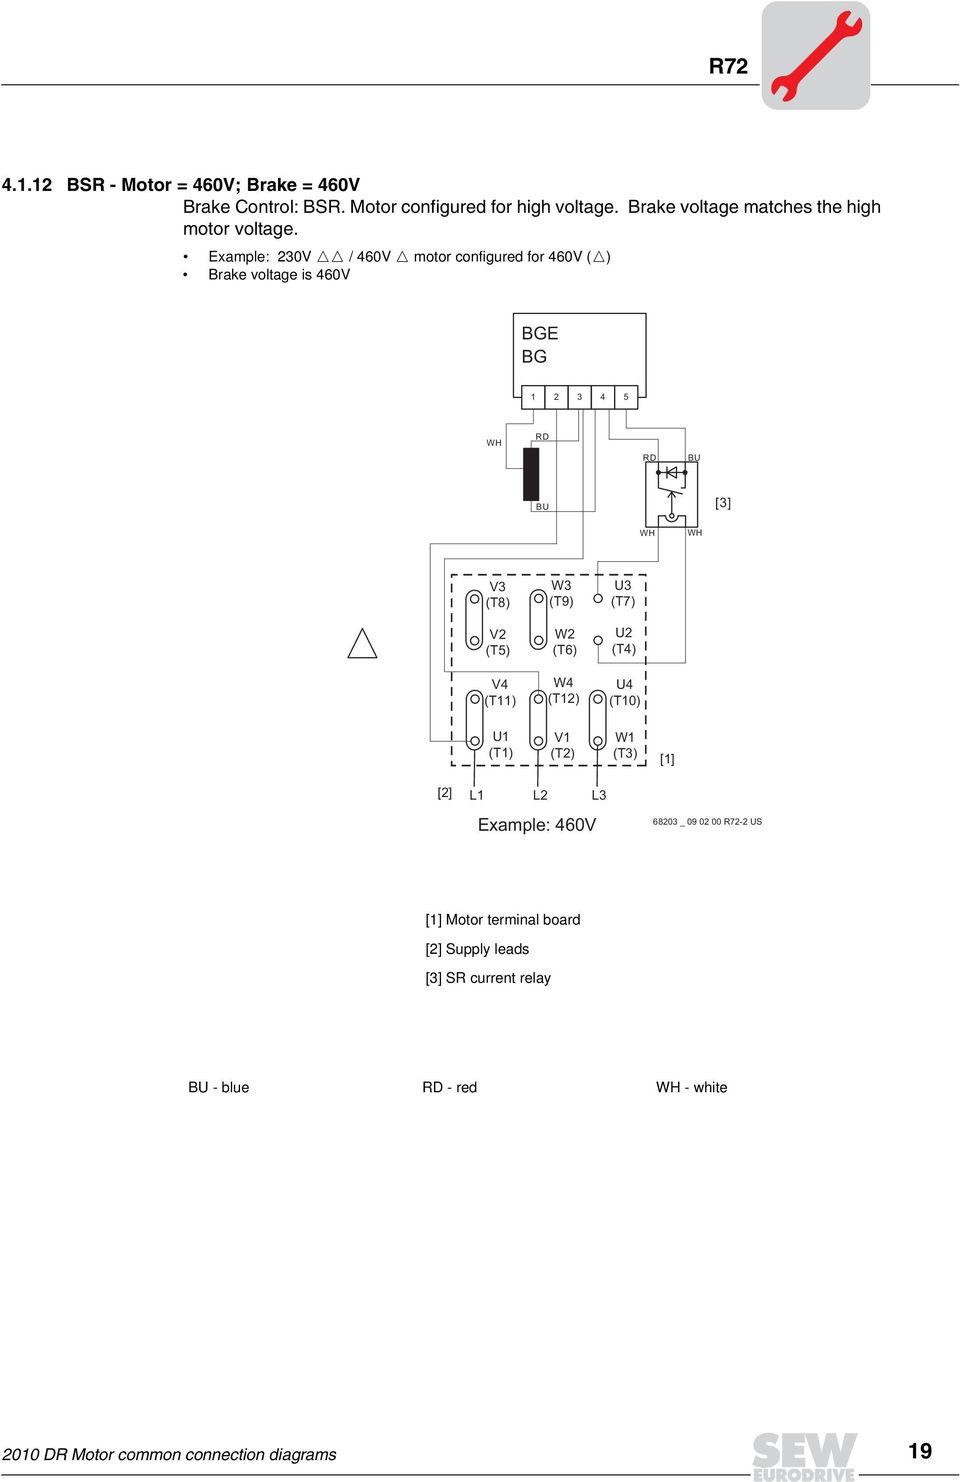 hight resolution of example 230v 460v motor configured for 460v brake voltage is 460v v3